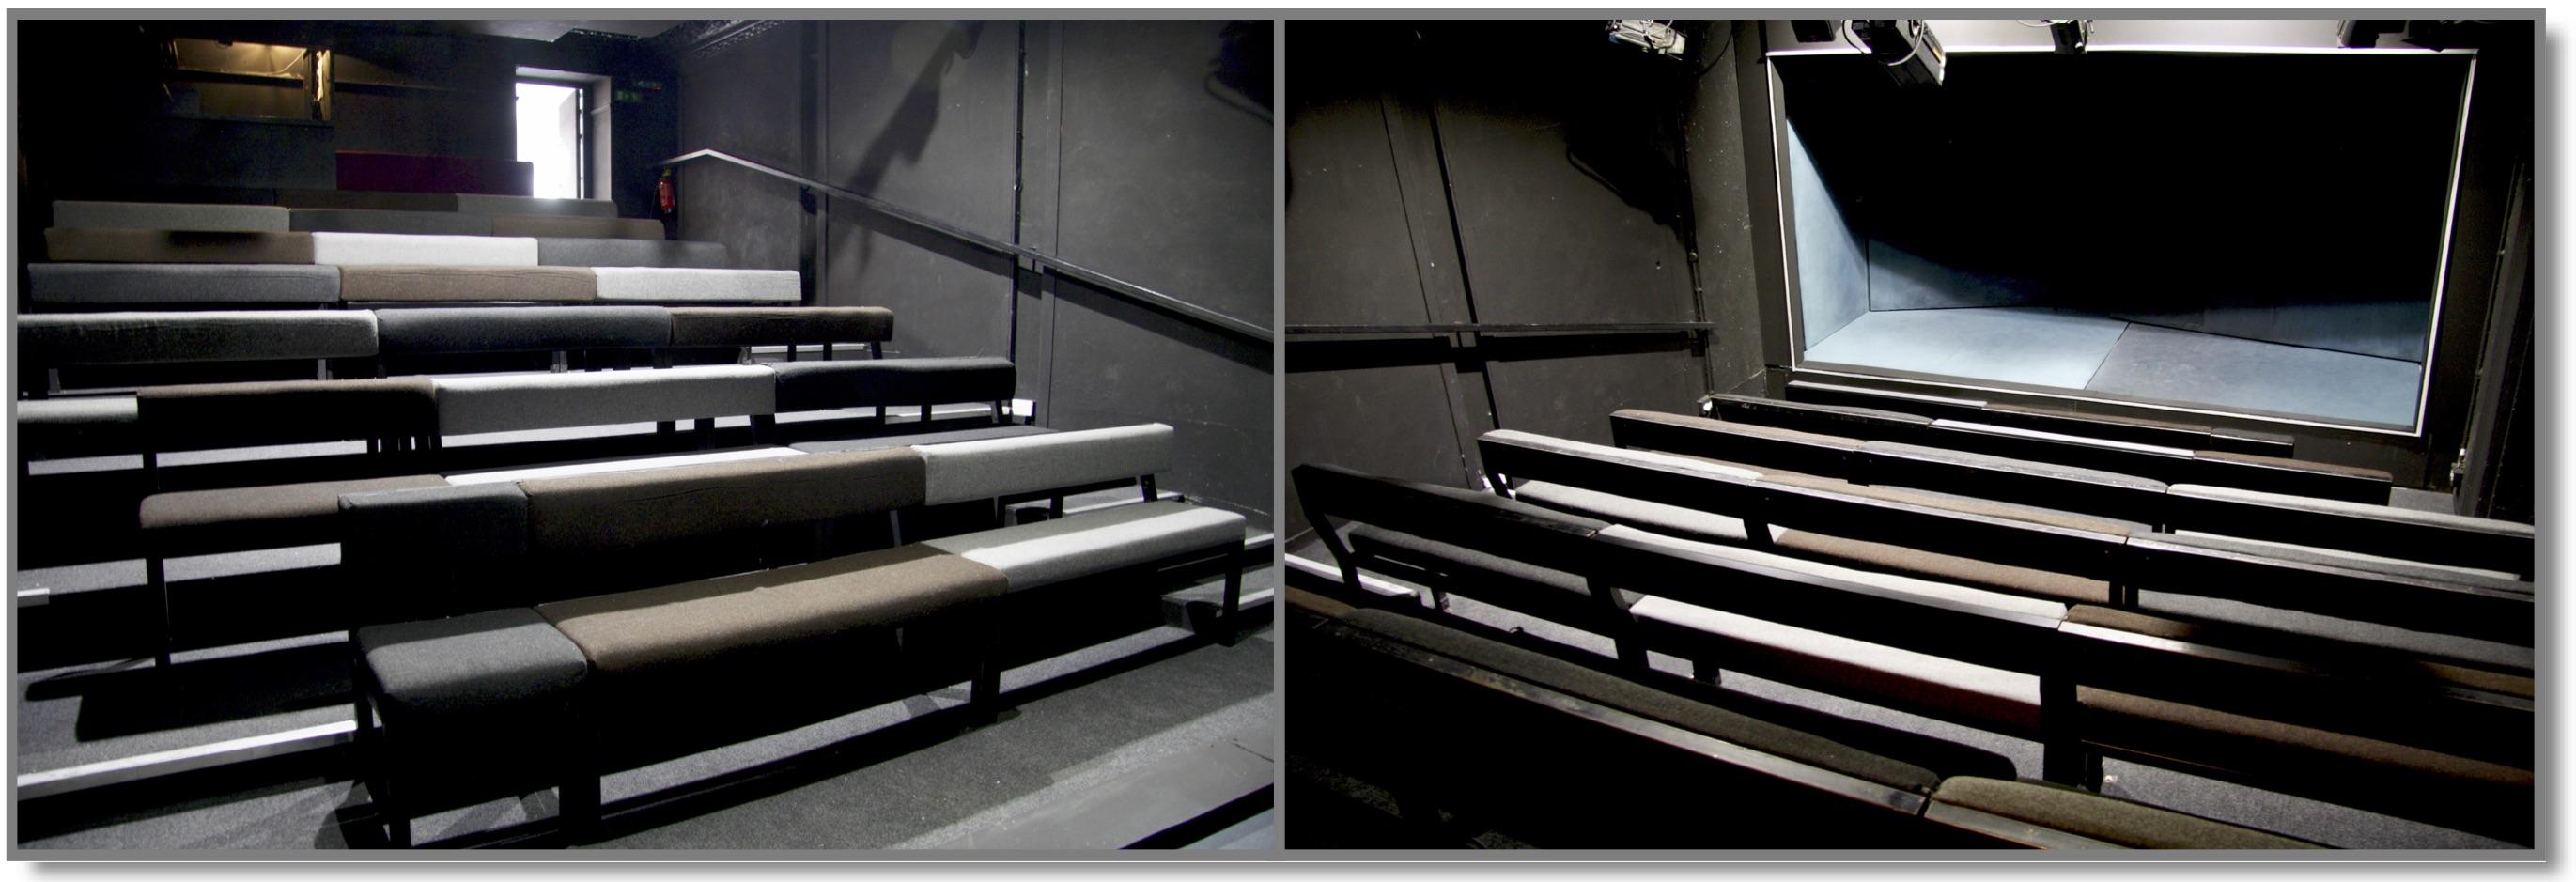 170512 Theatre 503 b